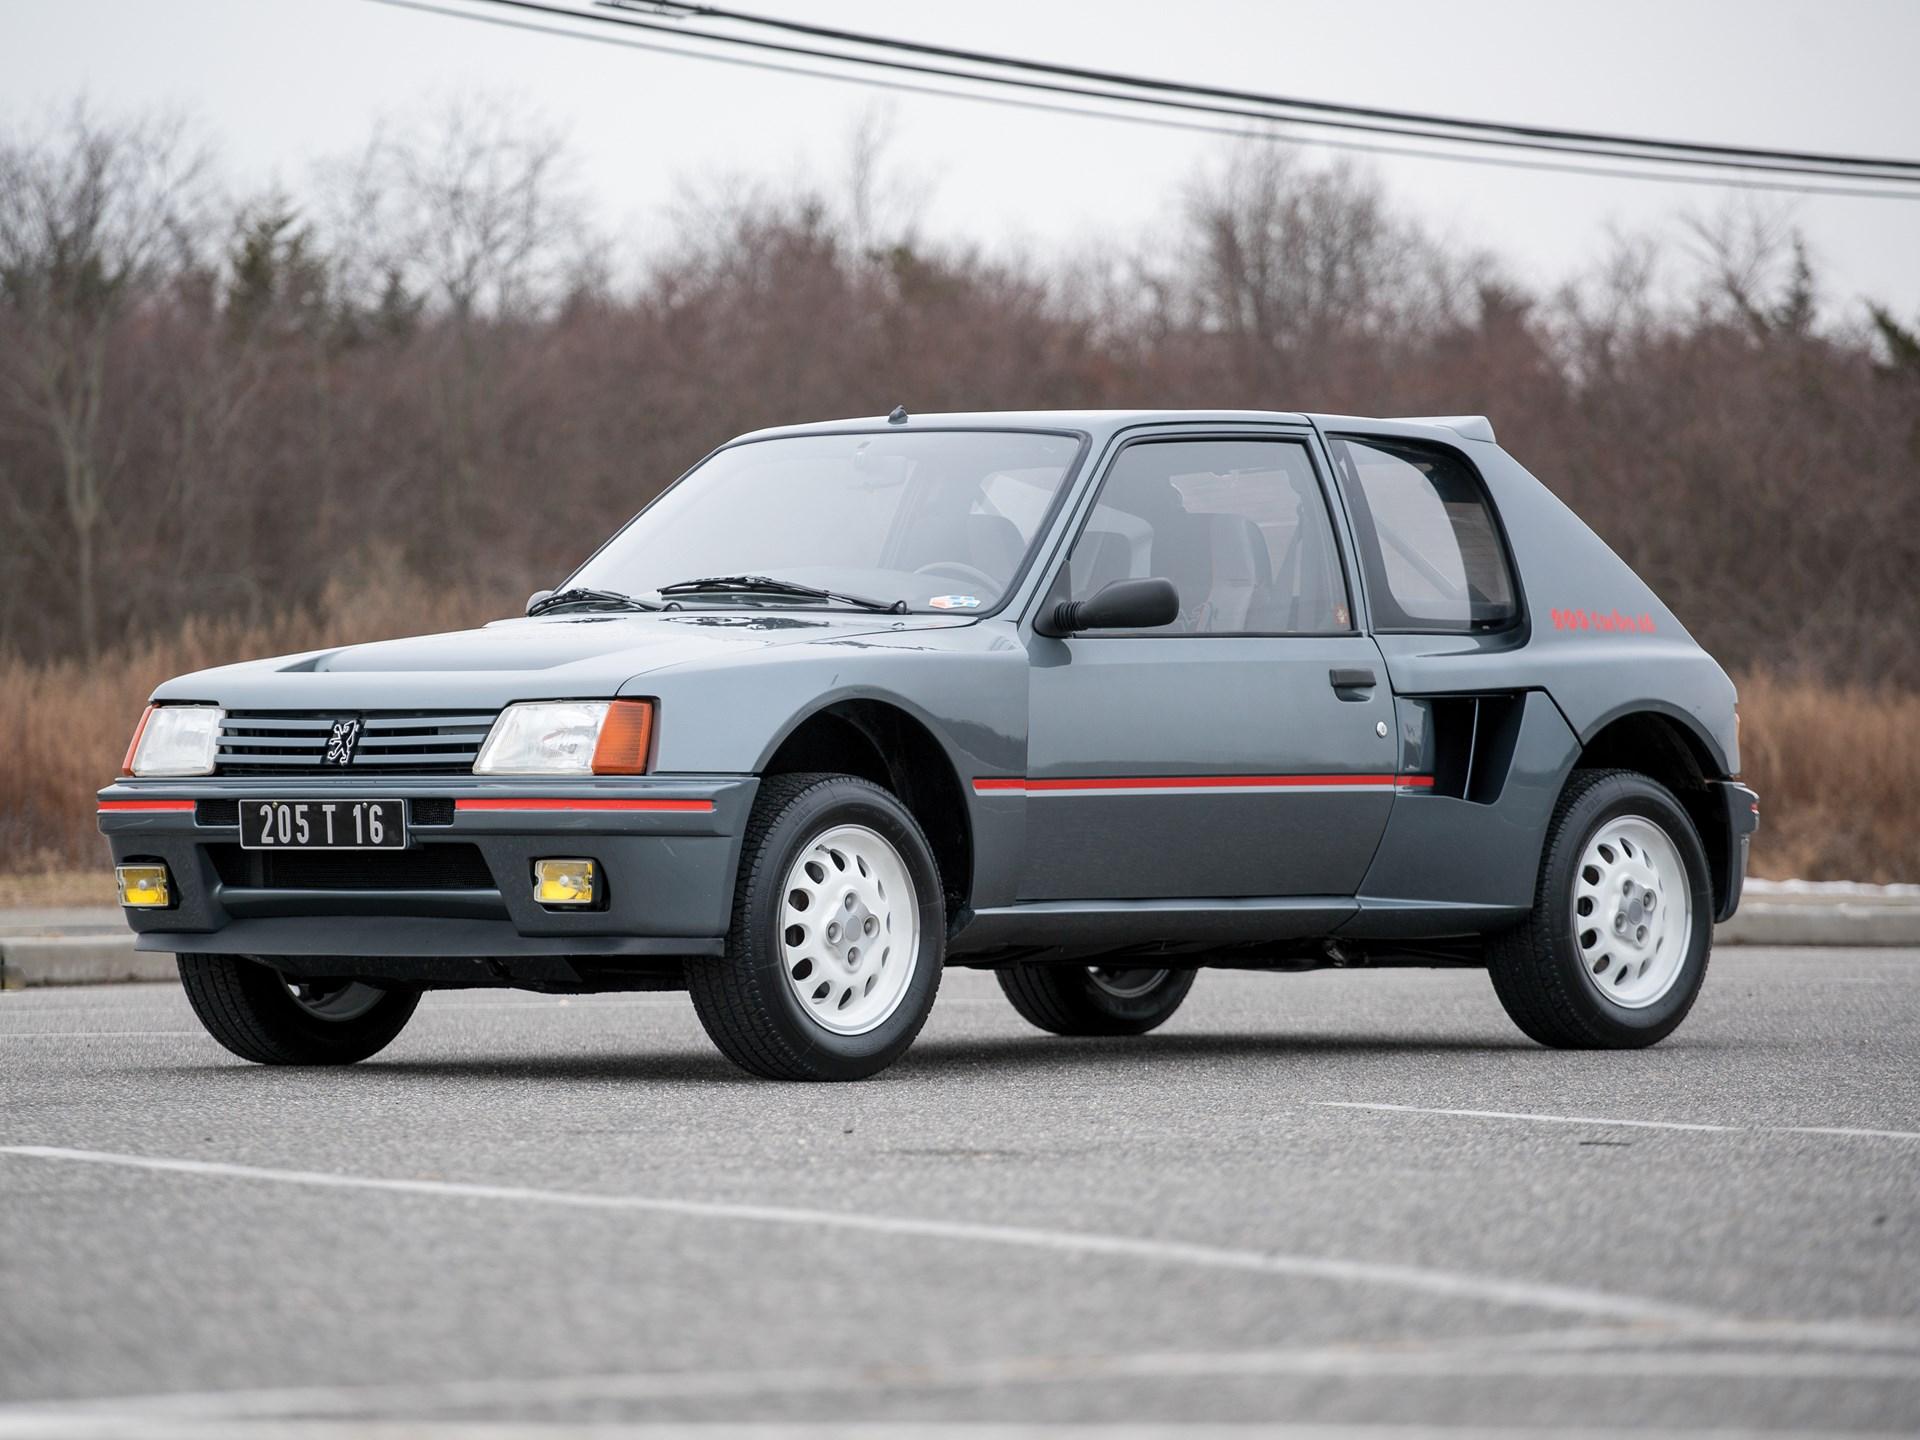 rm sotheby's - 1984 peugeot 205 turbo 16 | amelia island 2018